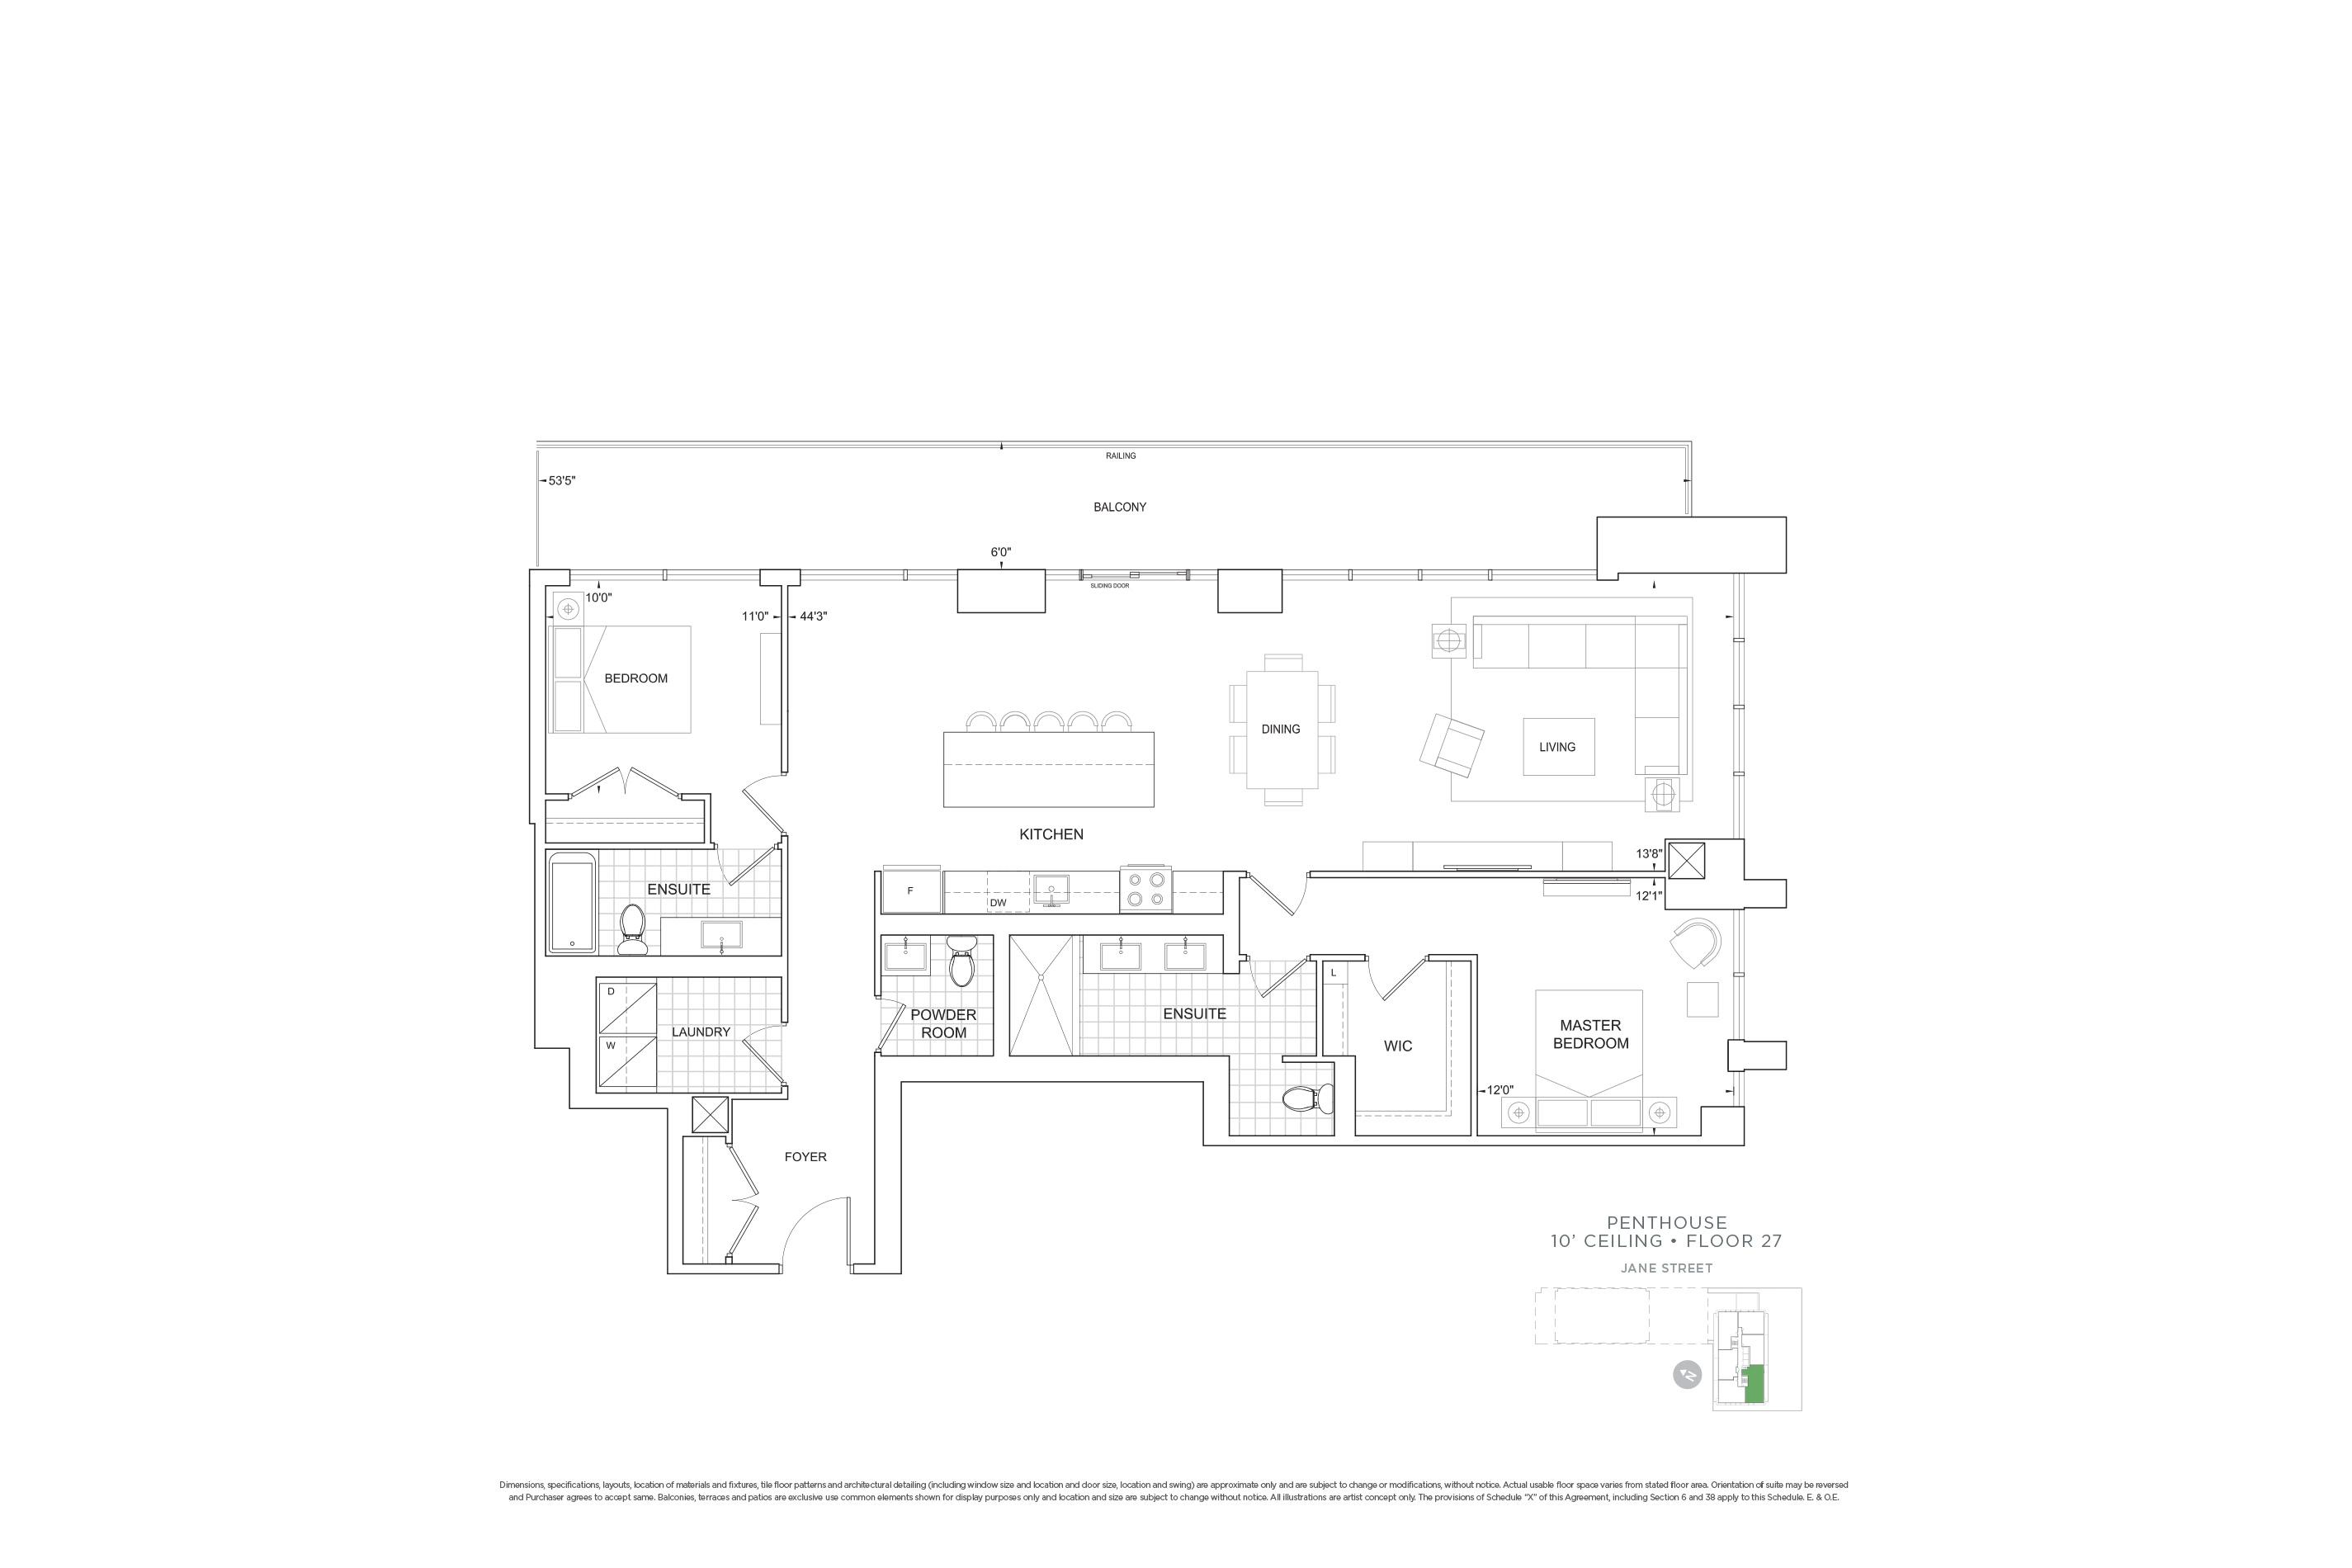 C1555 Penthouse Units